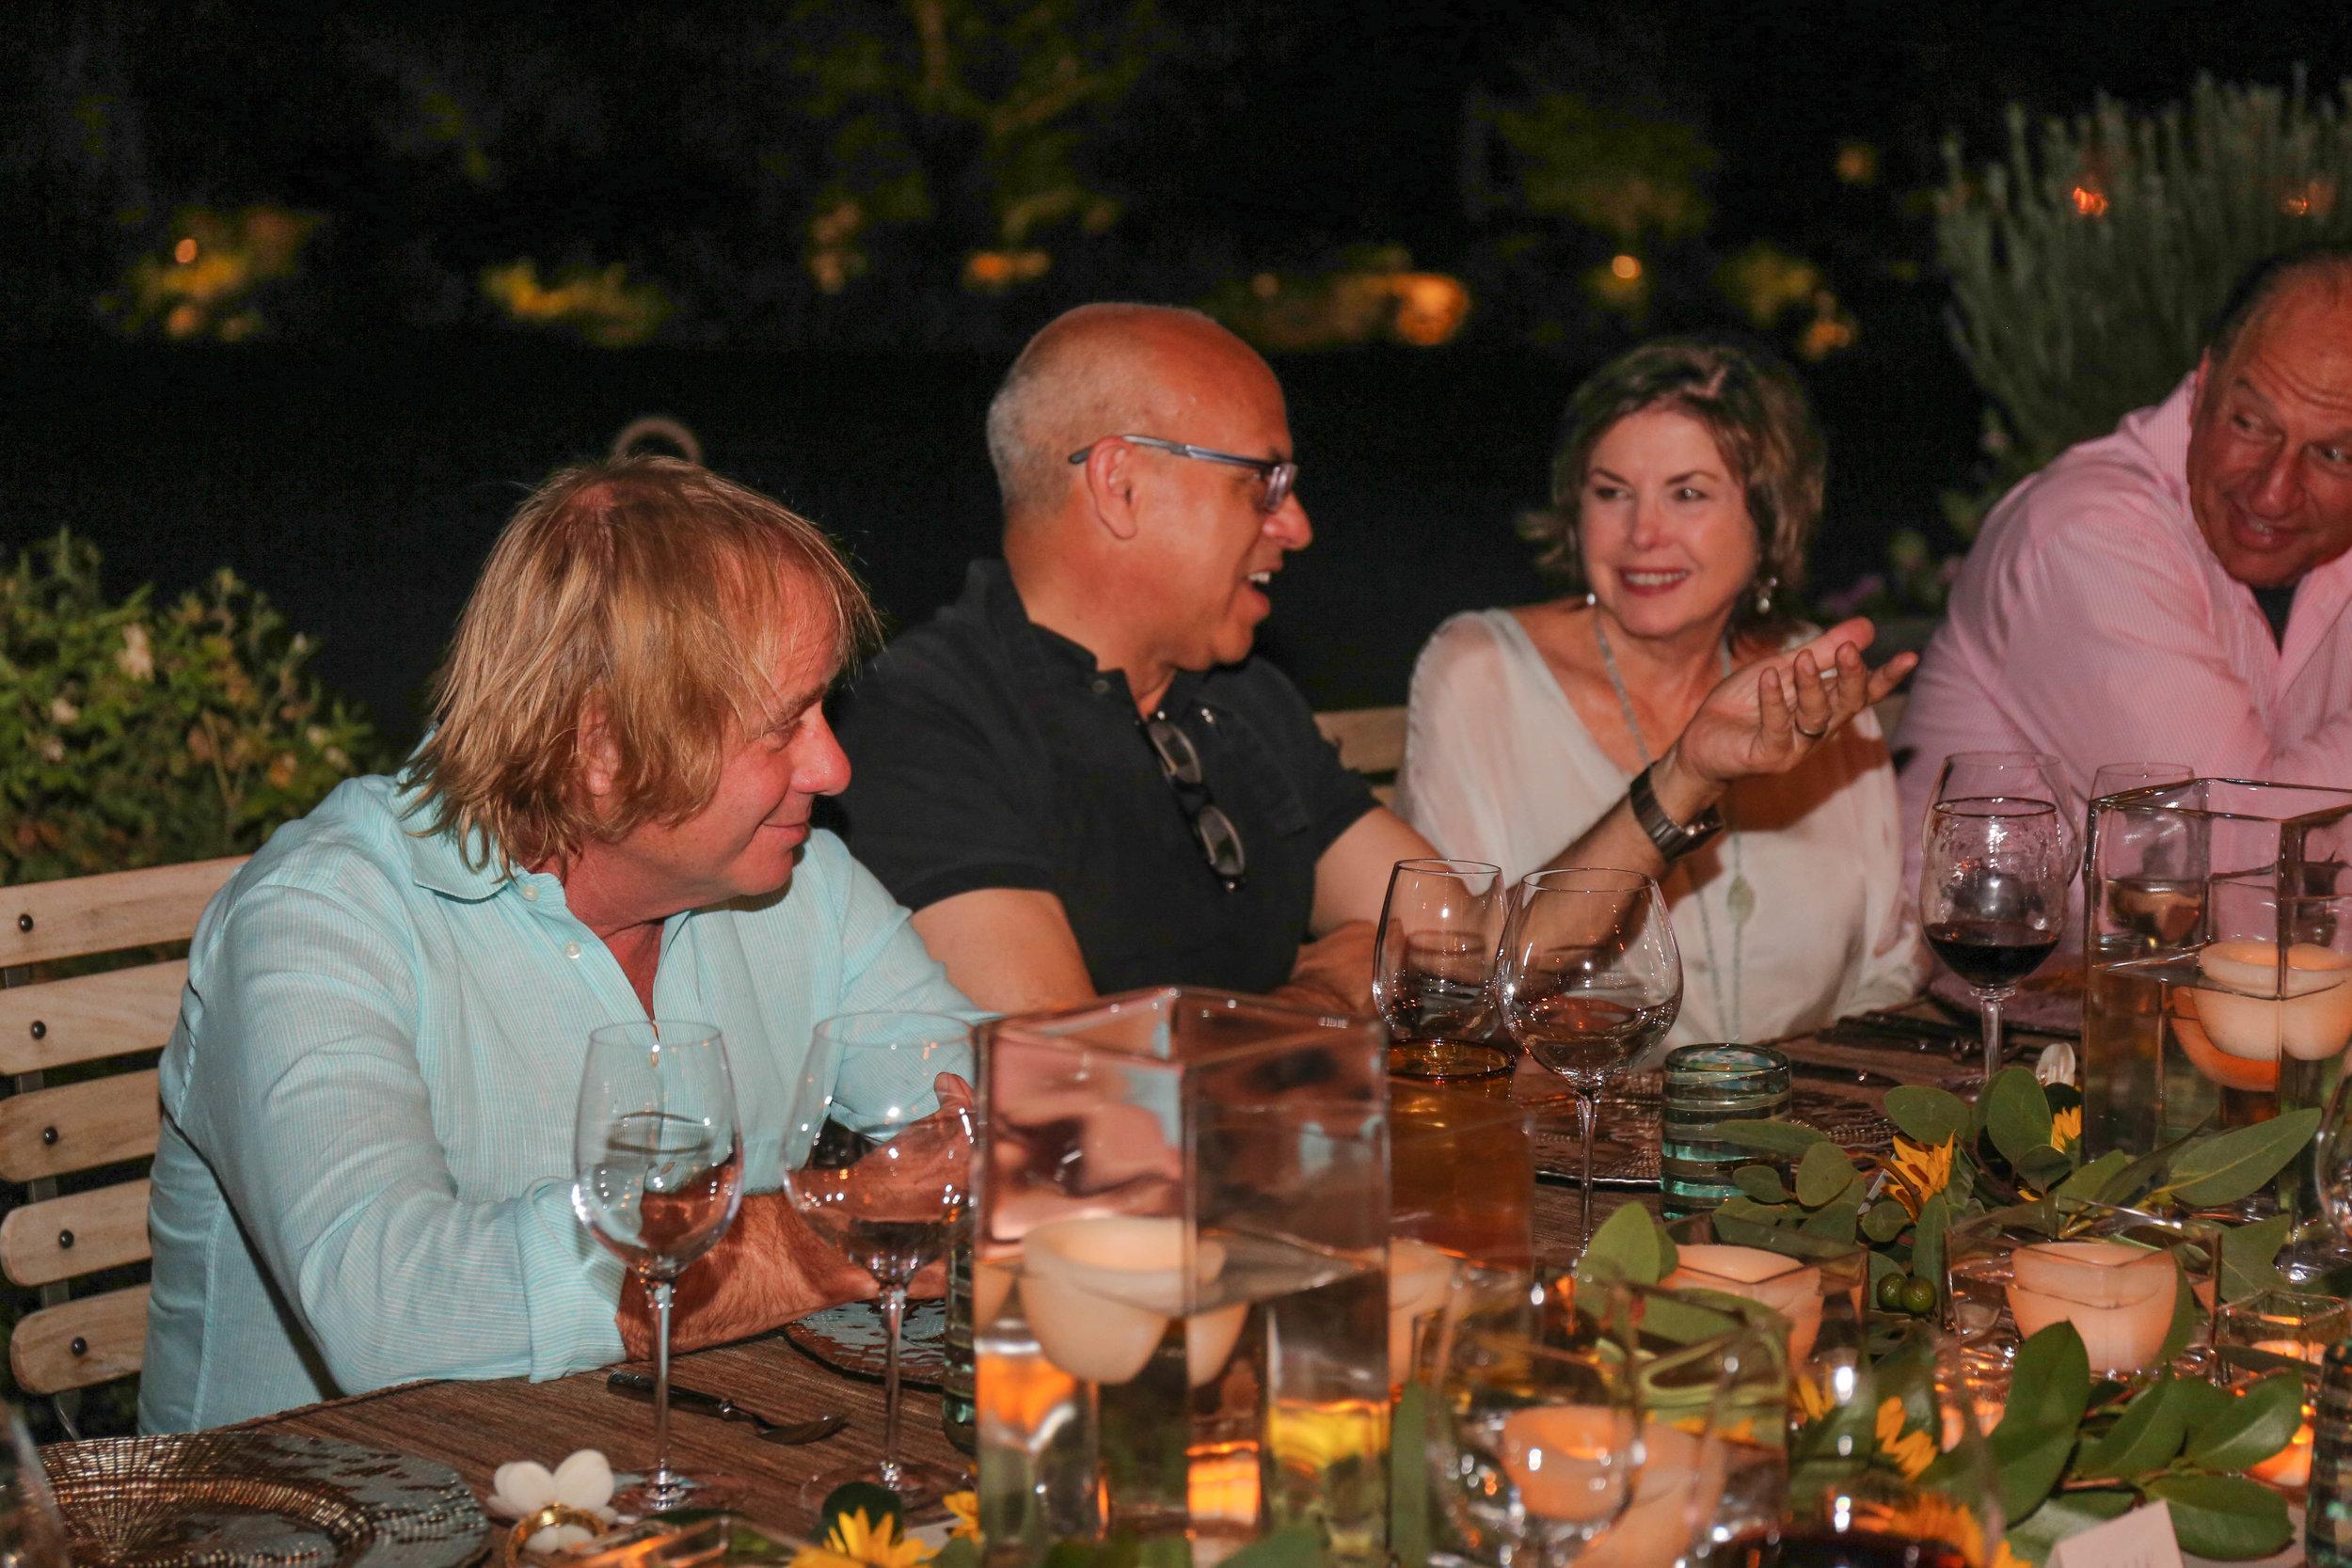 Walter Spitz, MC, Nancy Hanley and Jerry Meek dining at Zona Verde Oct 2017